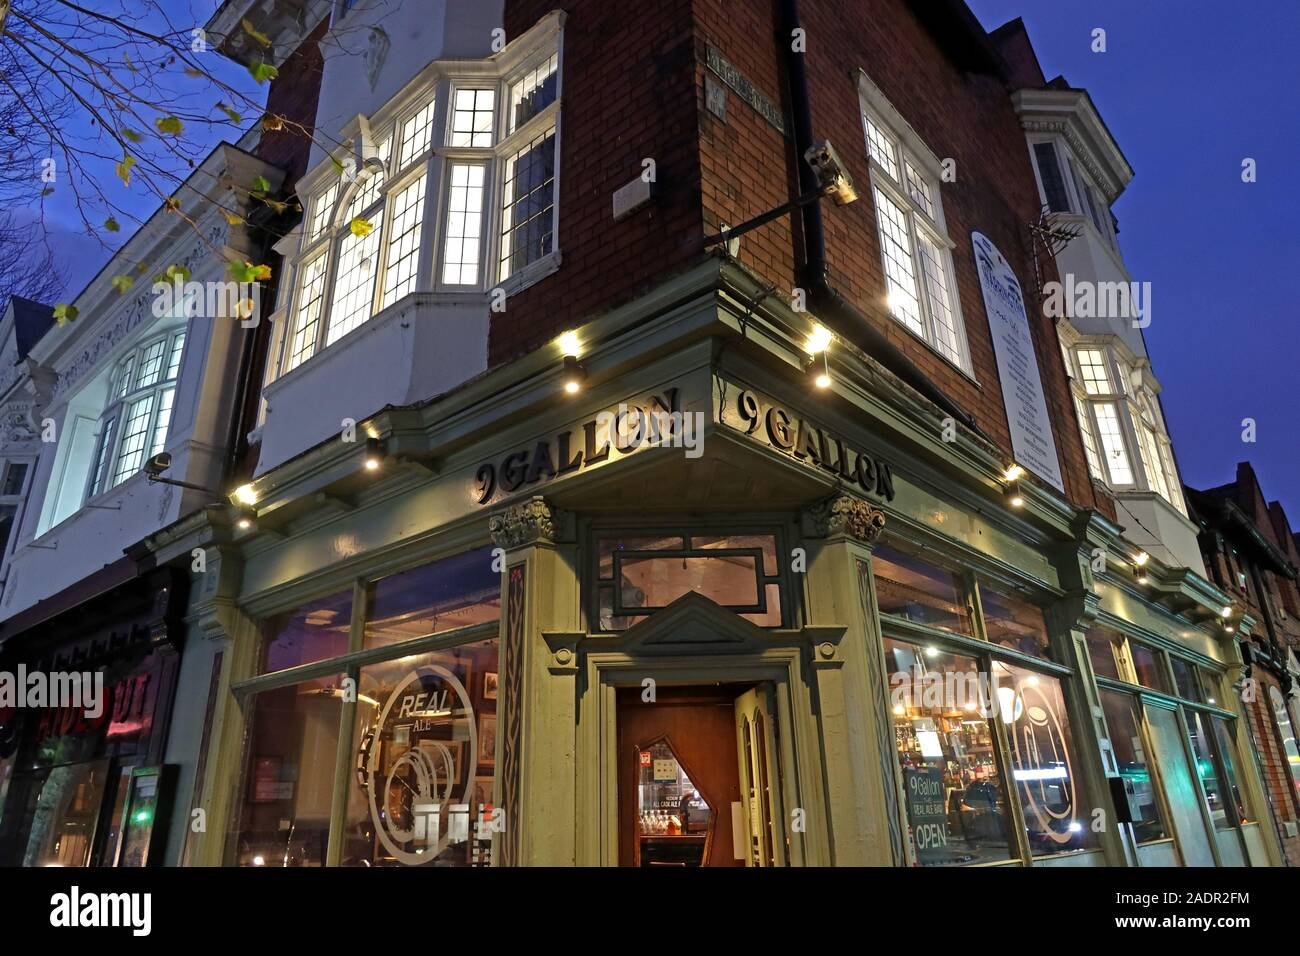 GoTonySmith,HotpixUK,@HotpixUK,Warrington,WBC,Warrington Borough Council,North West,pub,night,WA1,CAMRA,Sankey Street,real ale,bar,beer